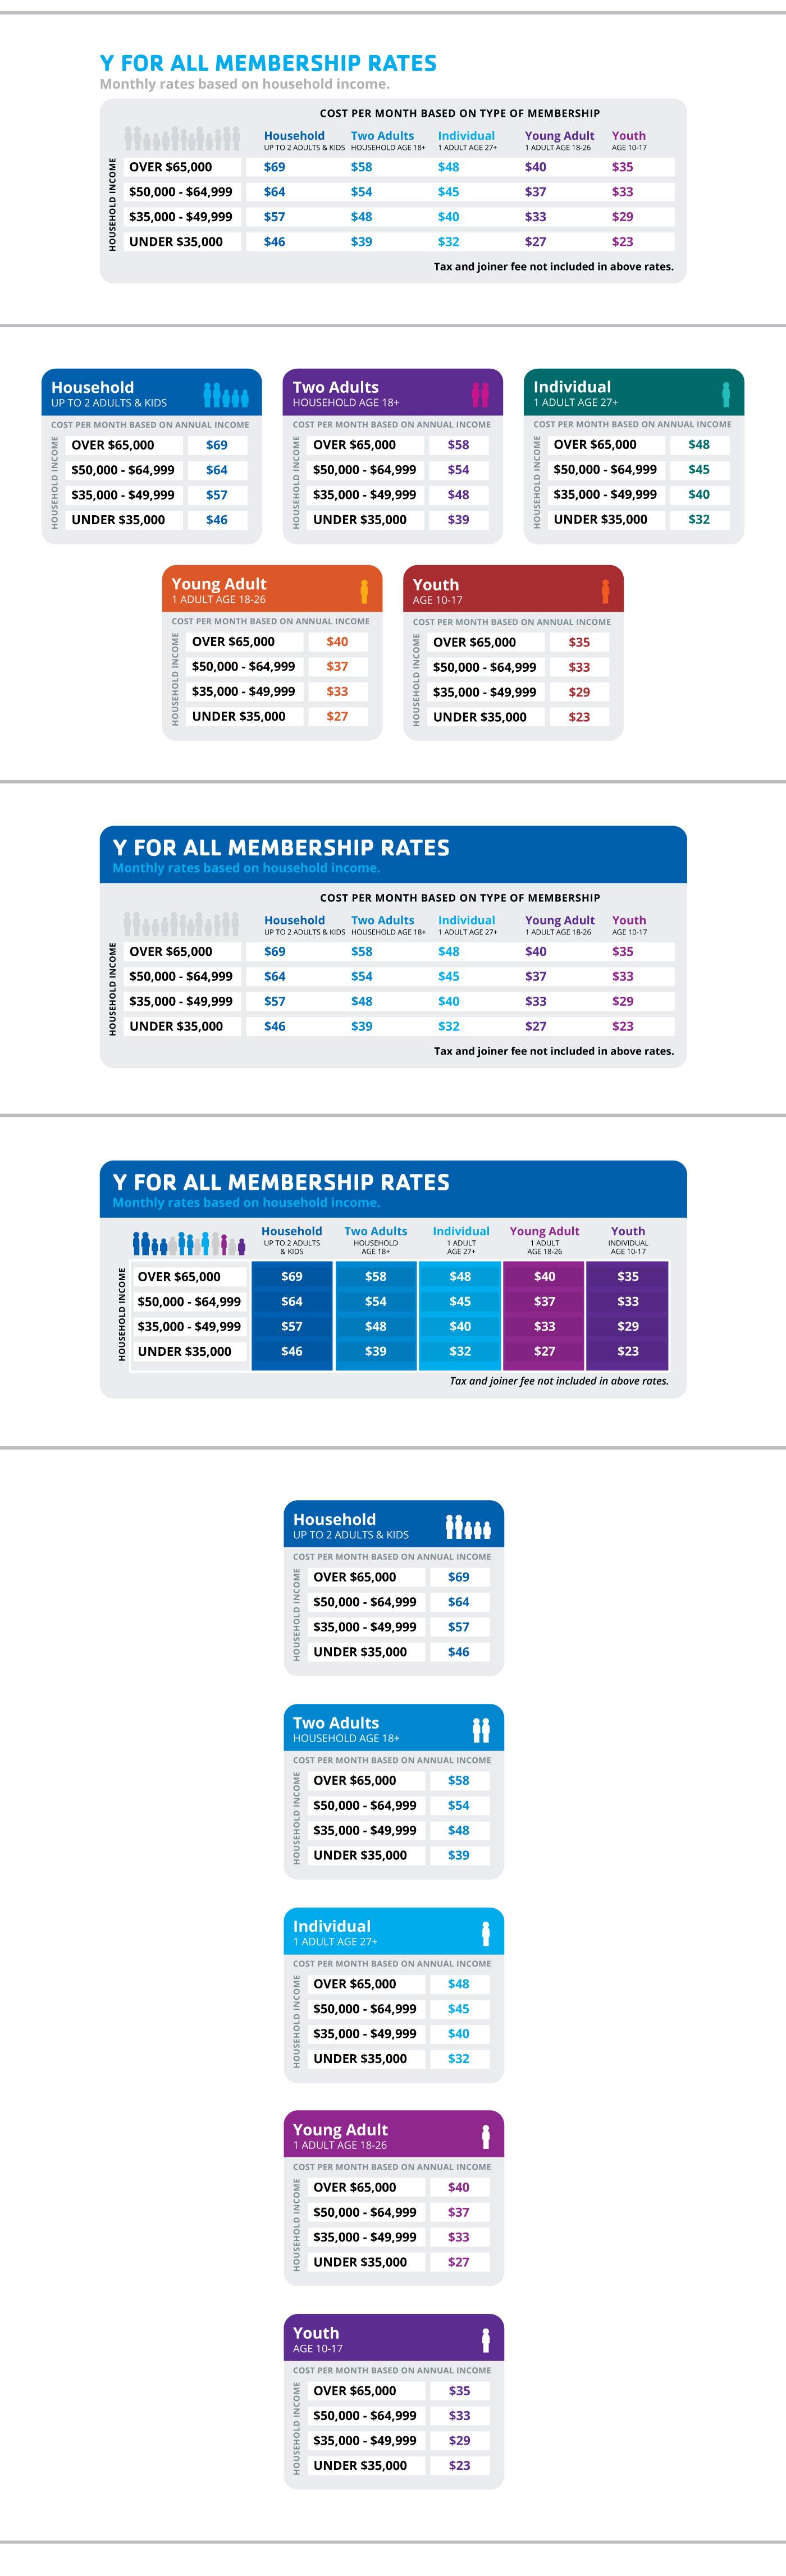 YMCA Digital Best Pratices: Income Based Membership Rates